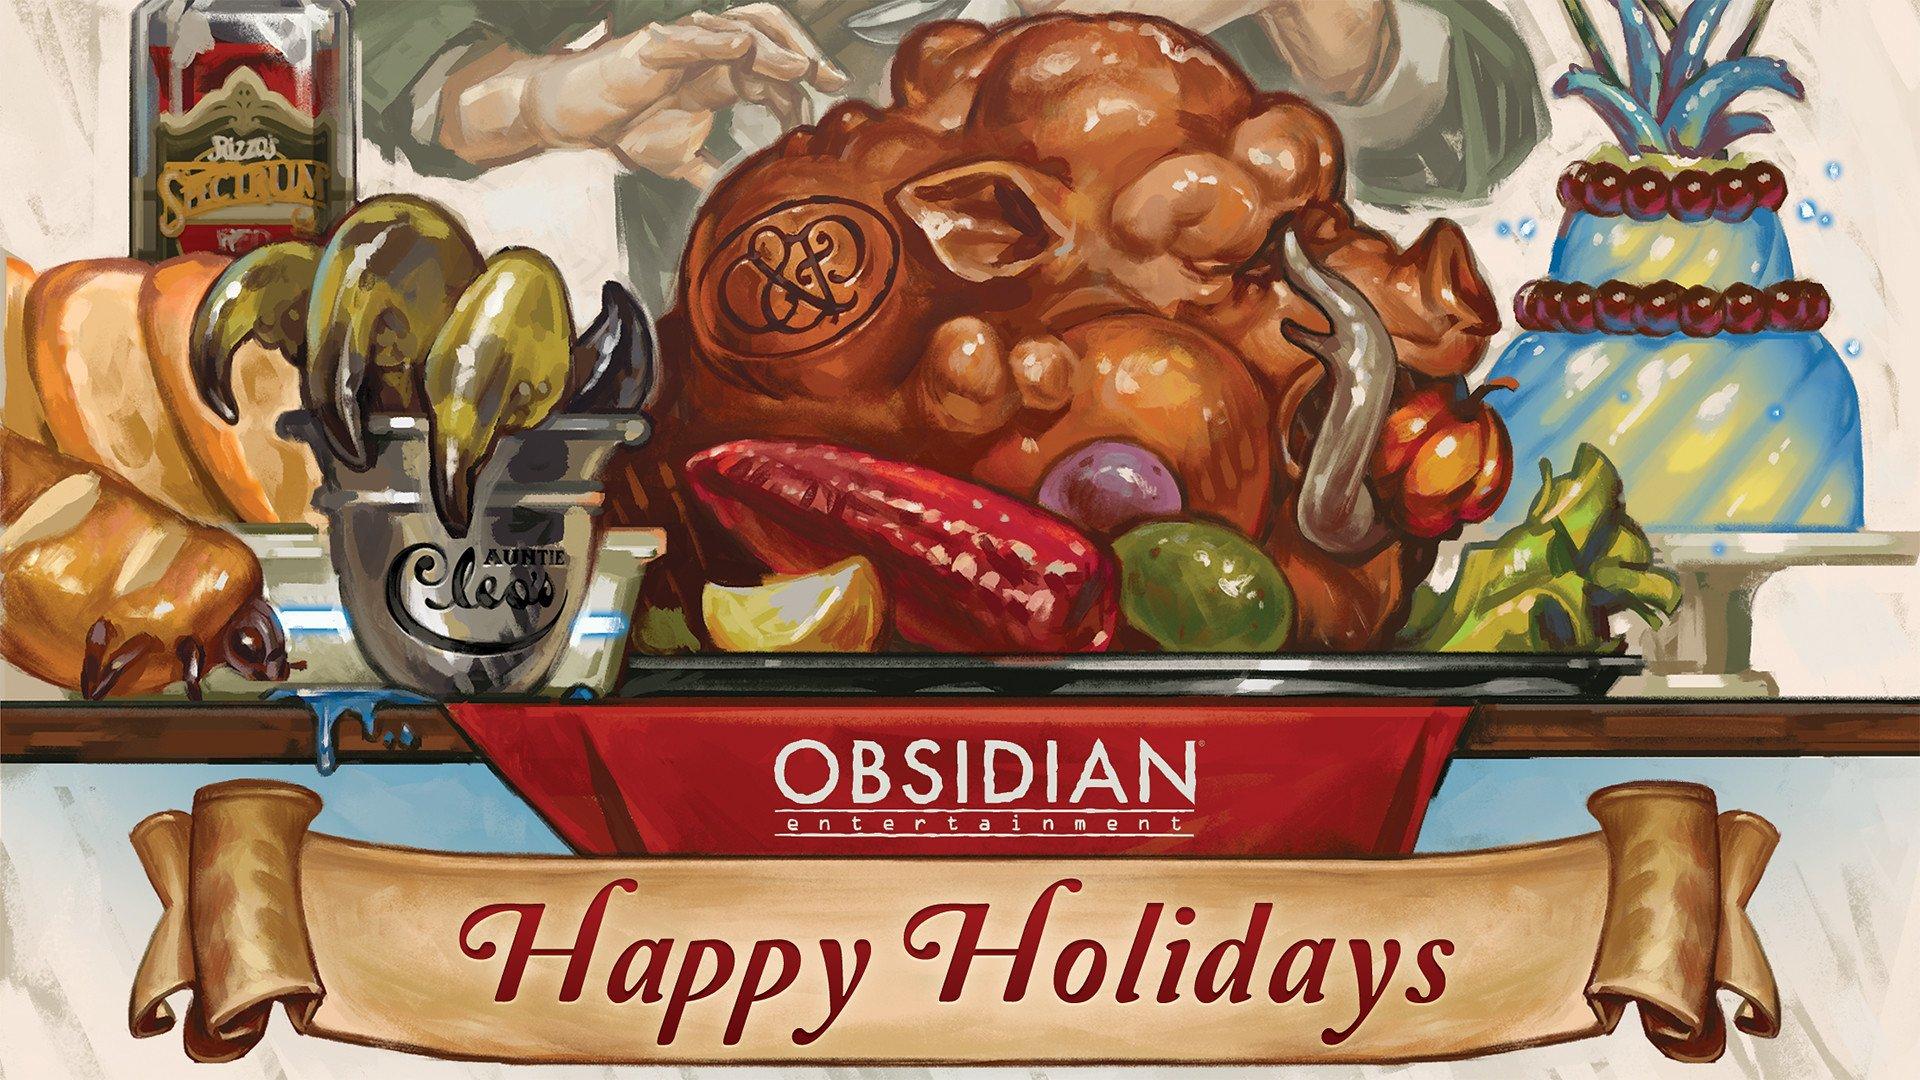 Obsidian Enternainment Happy Holidays HD Wallpaper